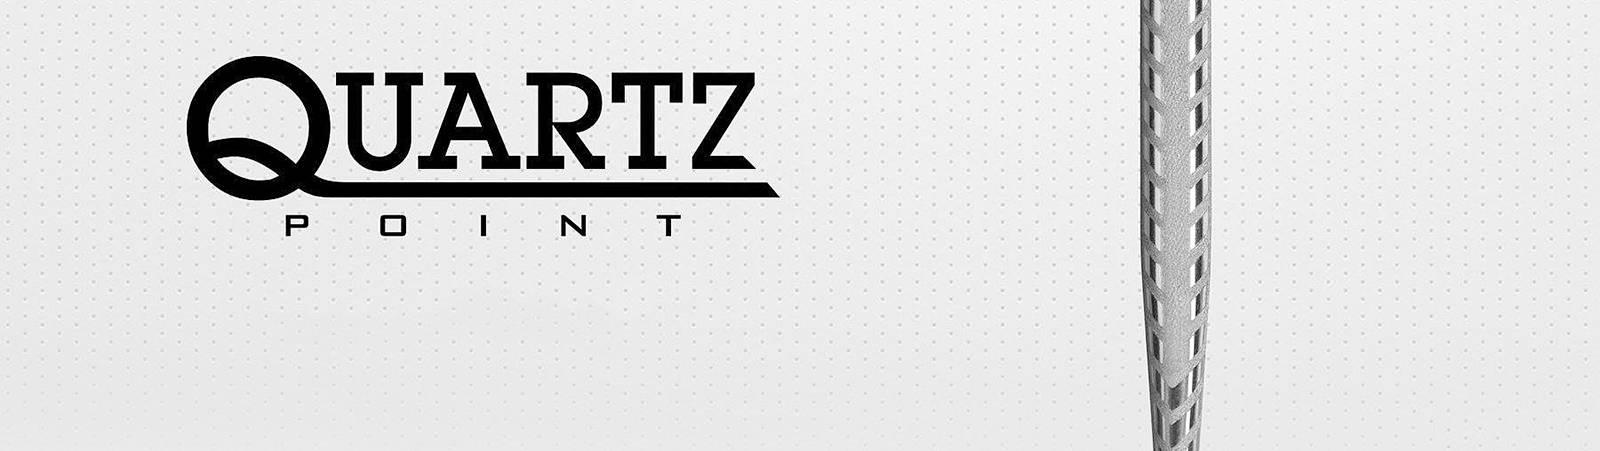 Target Quartz Points Steeldartspitzen